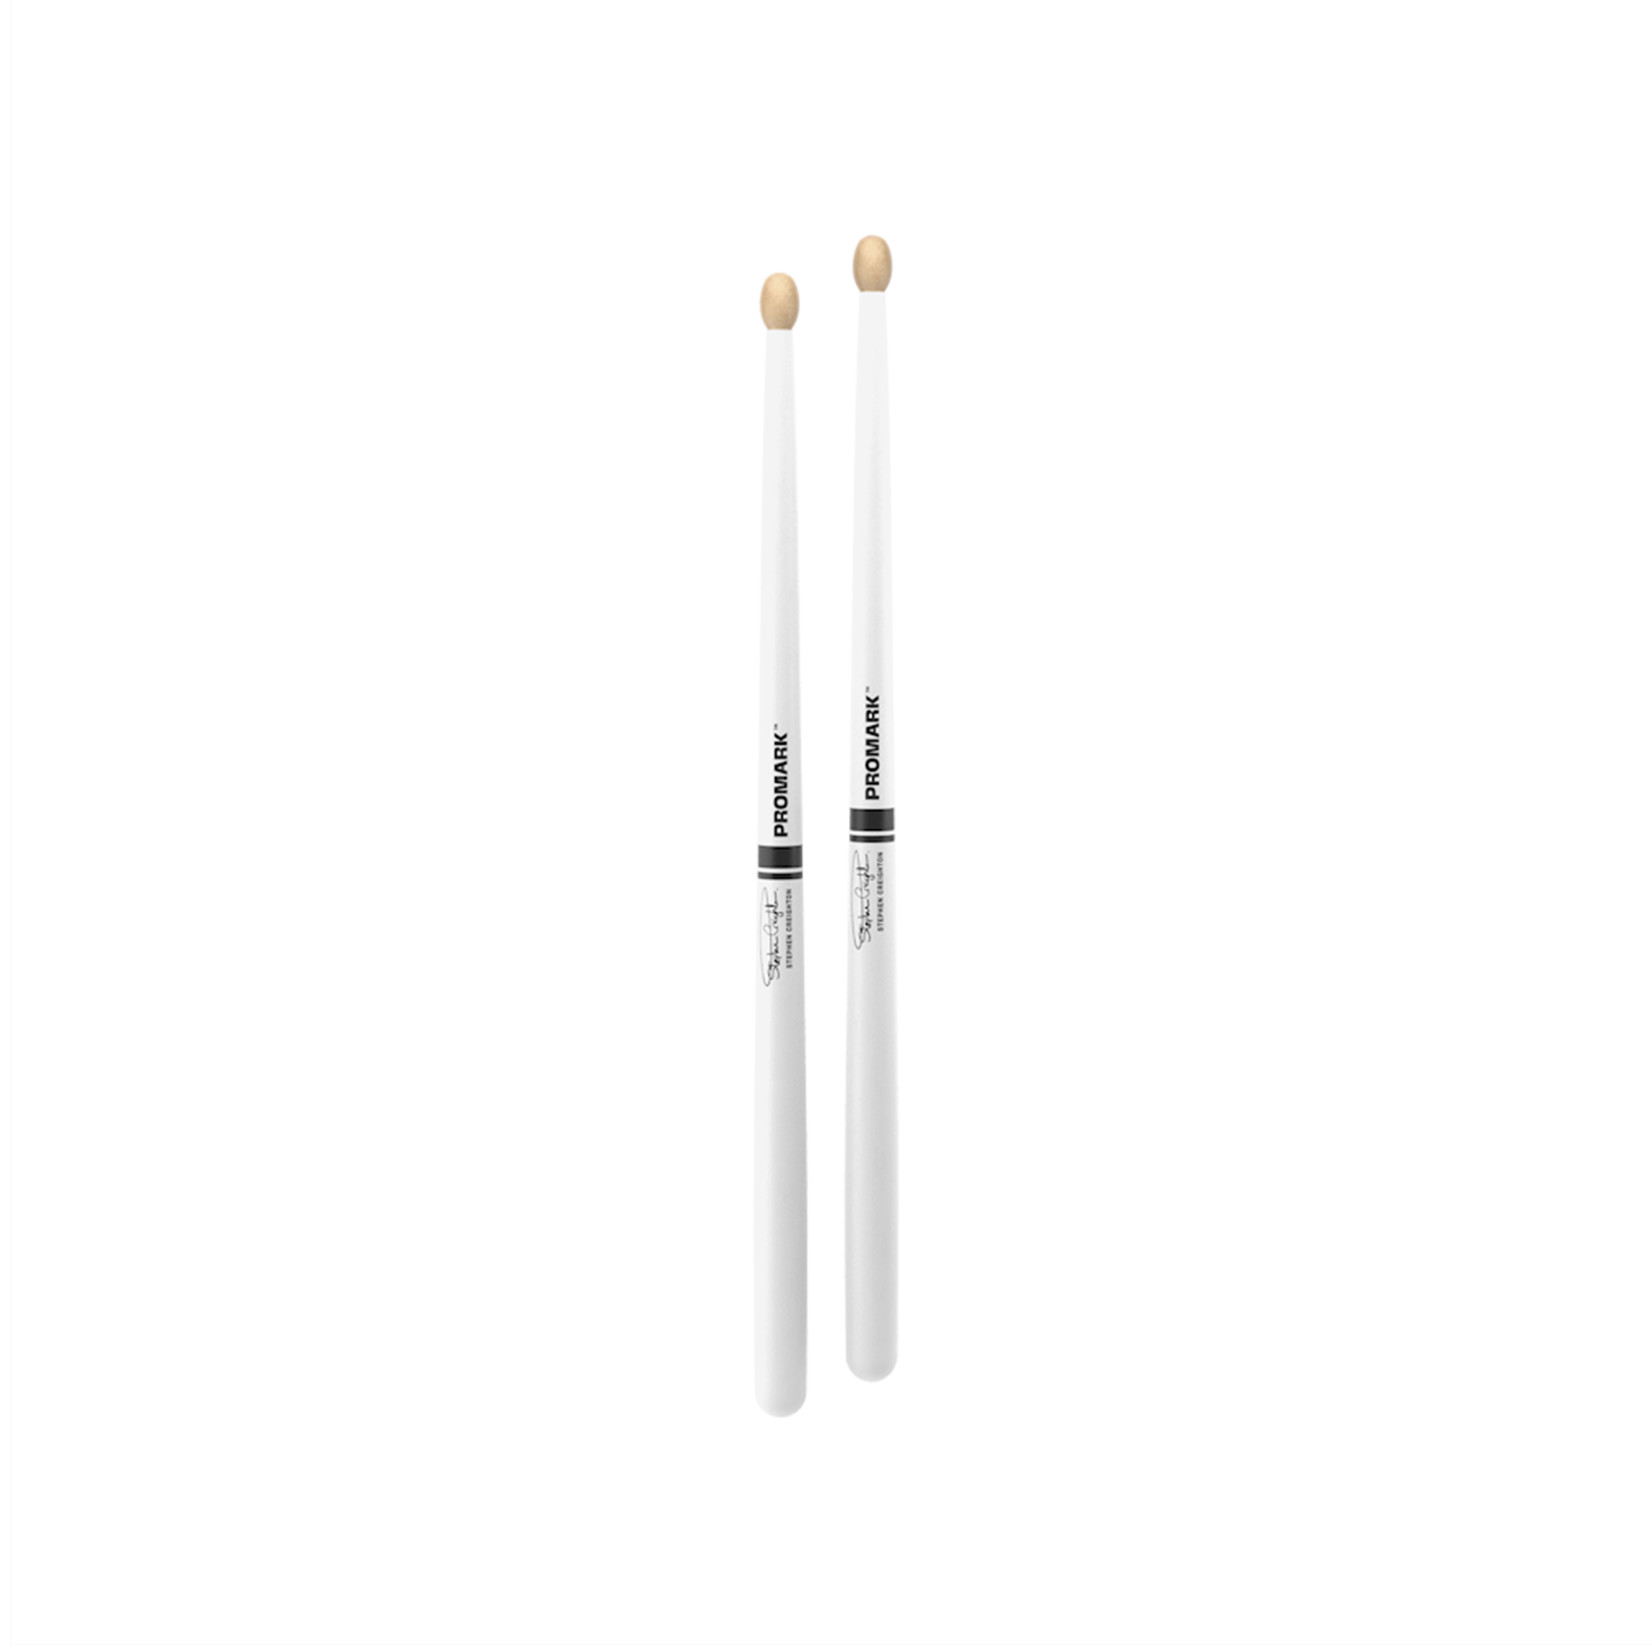 Promark ProMark Stephen Creighton 2000, Maple White Wood Tip Drumstick